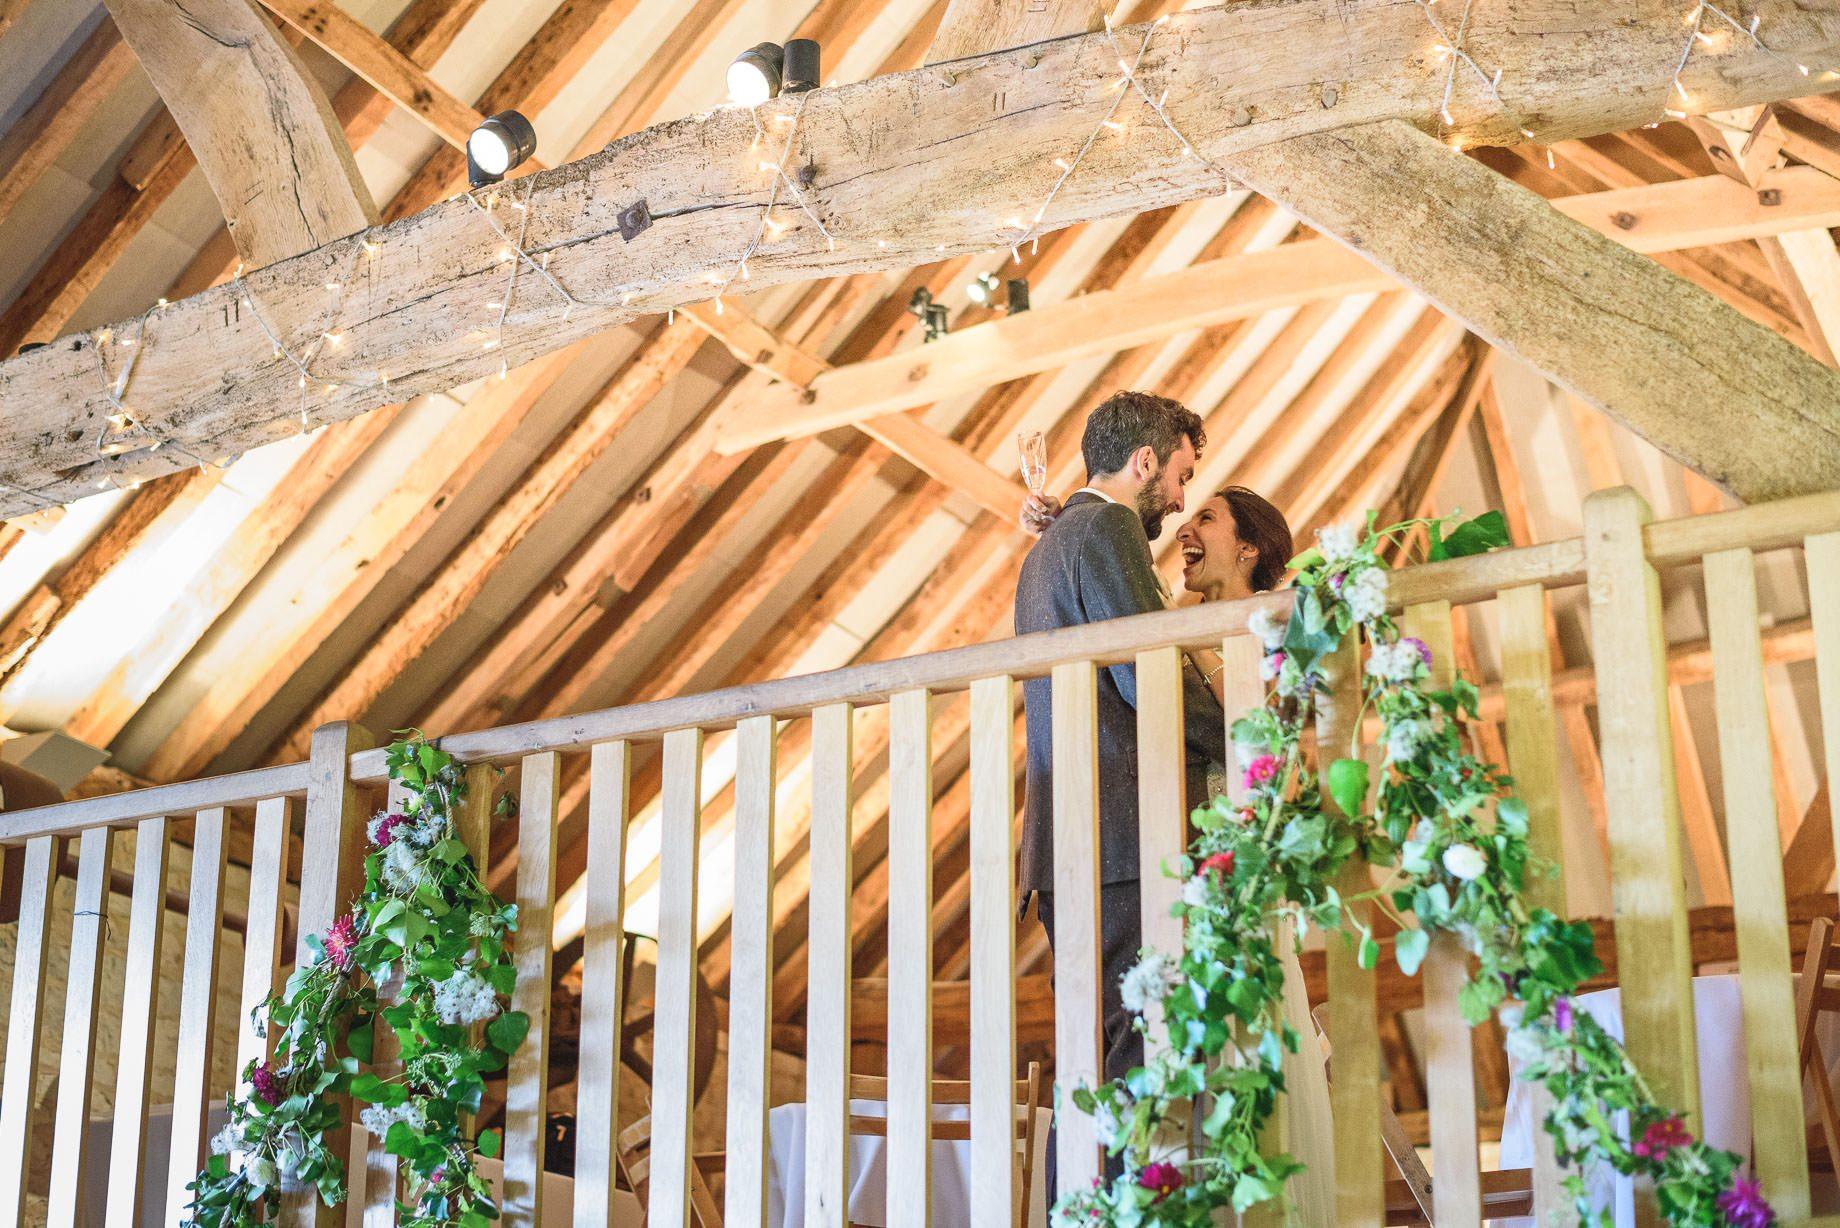 bury-court-barn-wedding-photography-guy-collier-photography-nadia-tom-138-of-184